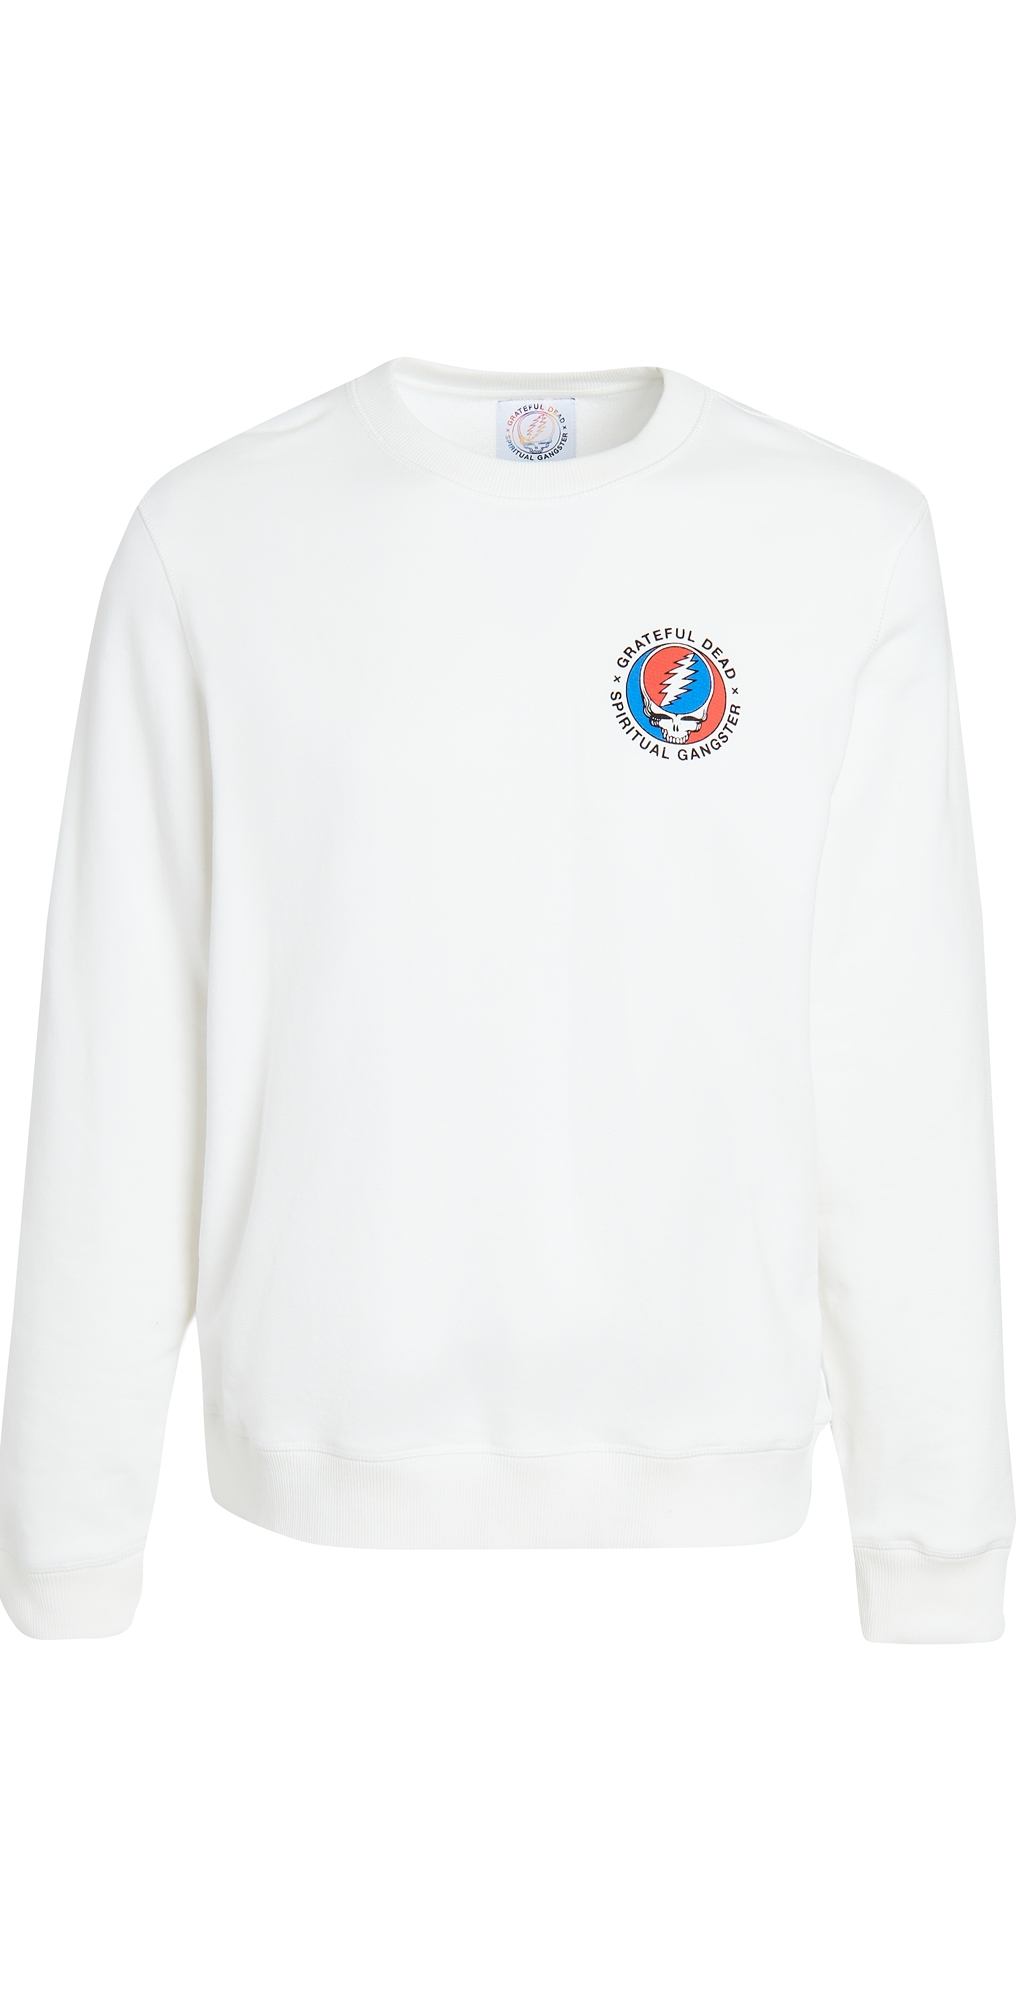 Spiritual Gangster x Grateful Dead Cover Classic Crew Sweatshirt